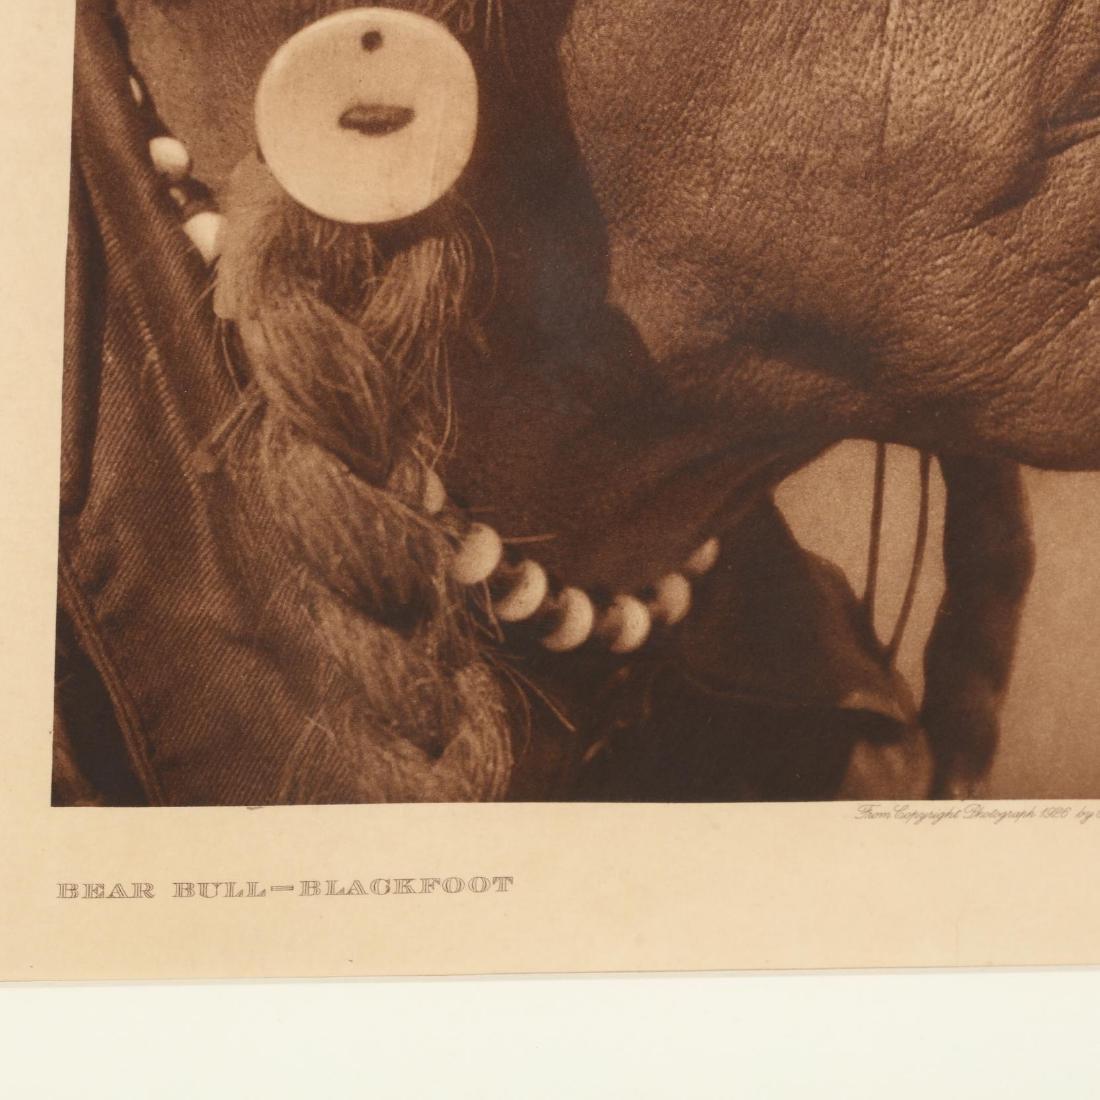 Edward S. Curtis (American, 1868-1952),  Bear Bull - - 2